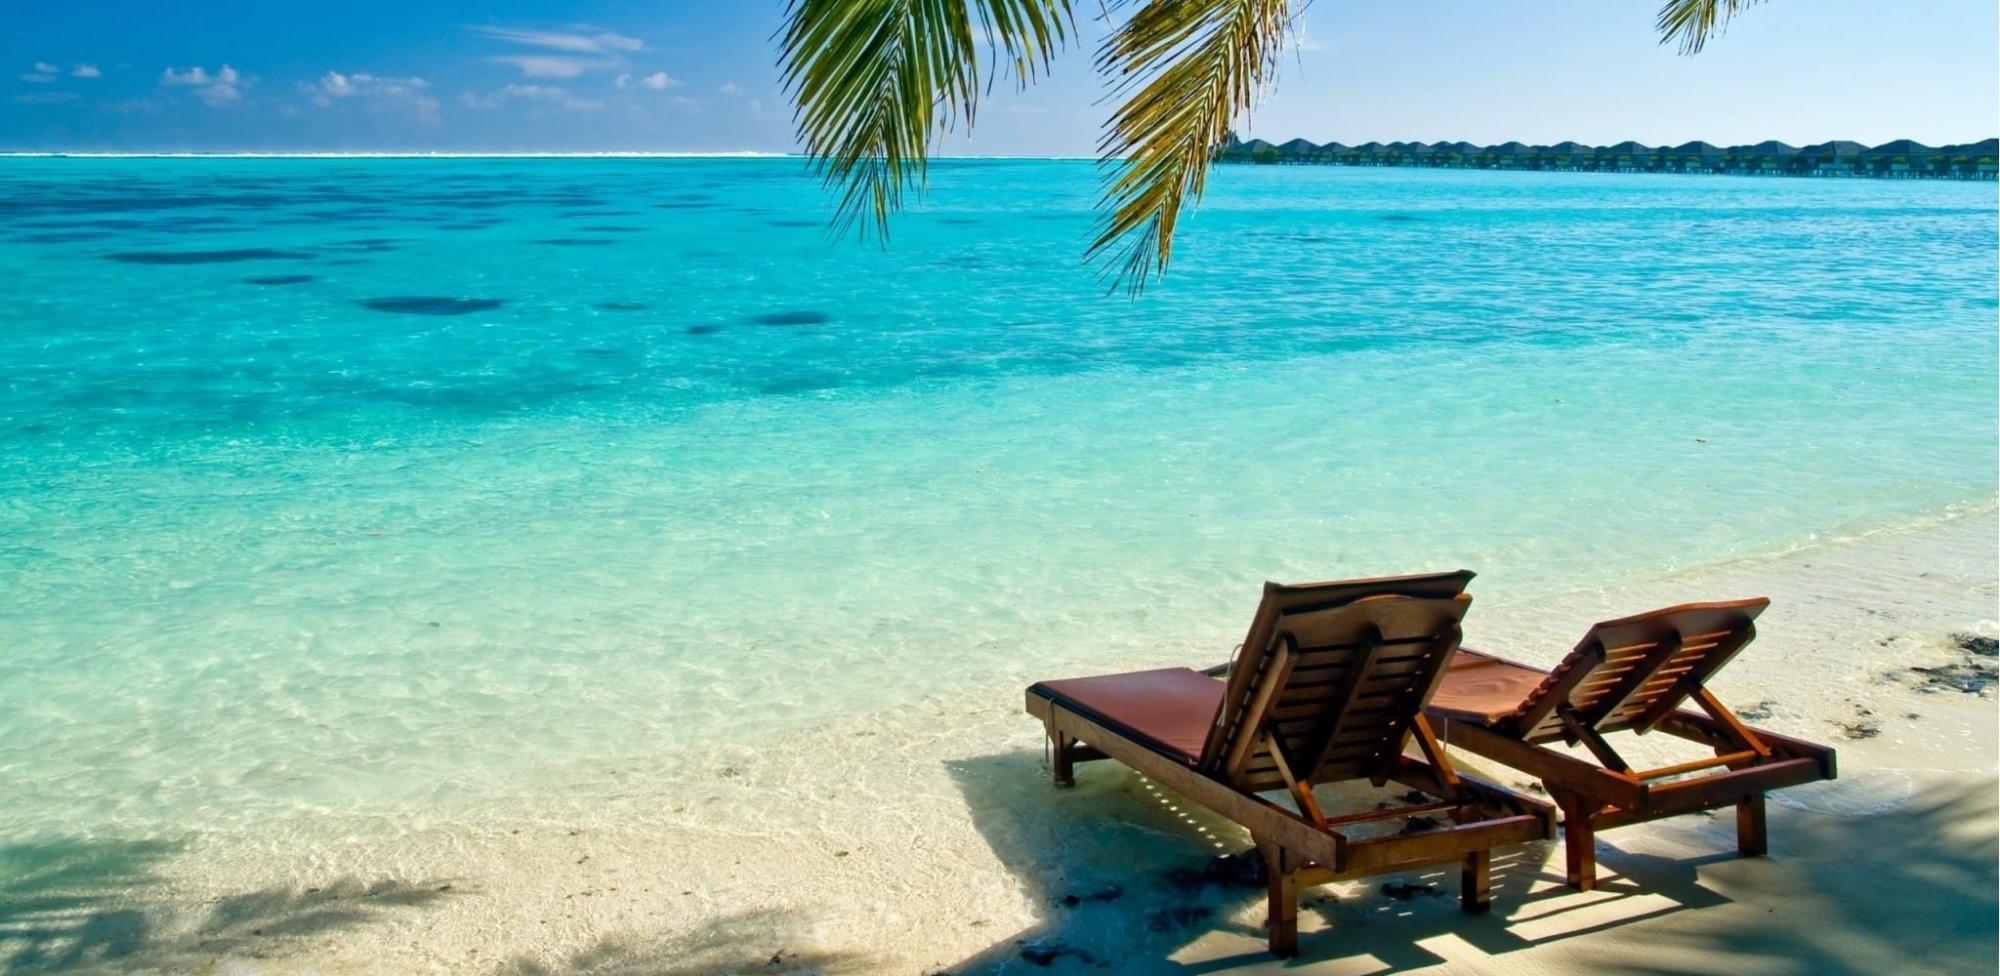 Iberostar Playa Pilar Resort - Cayo Guillermo